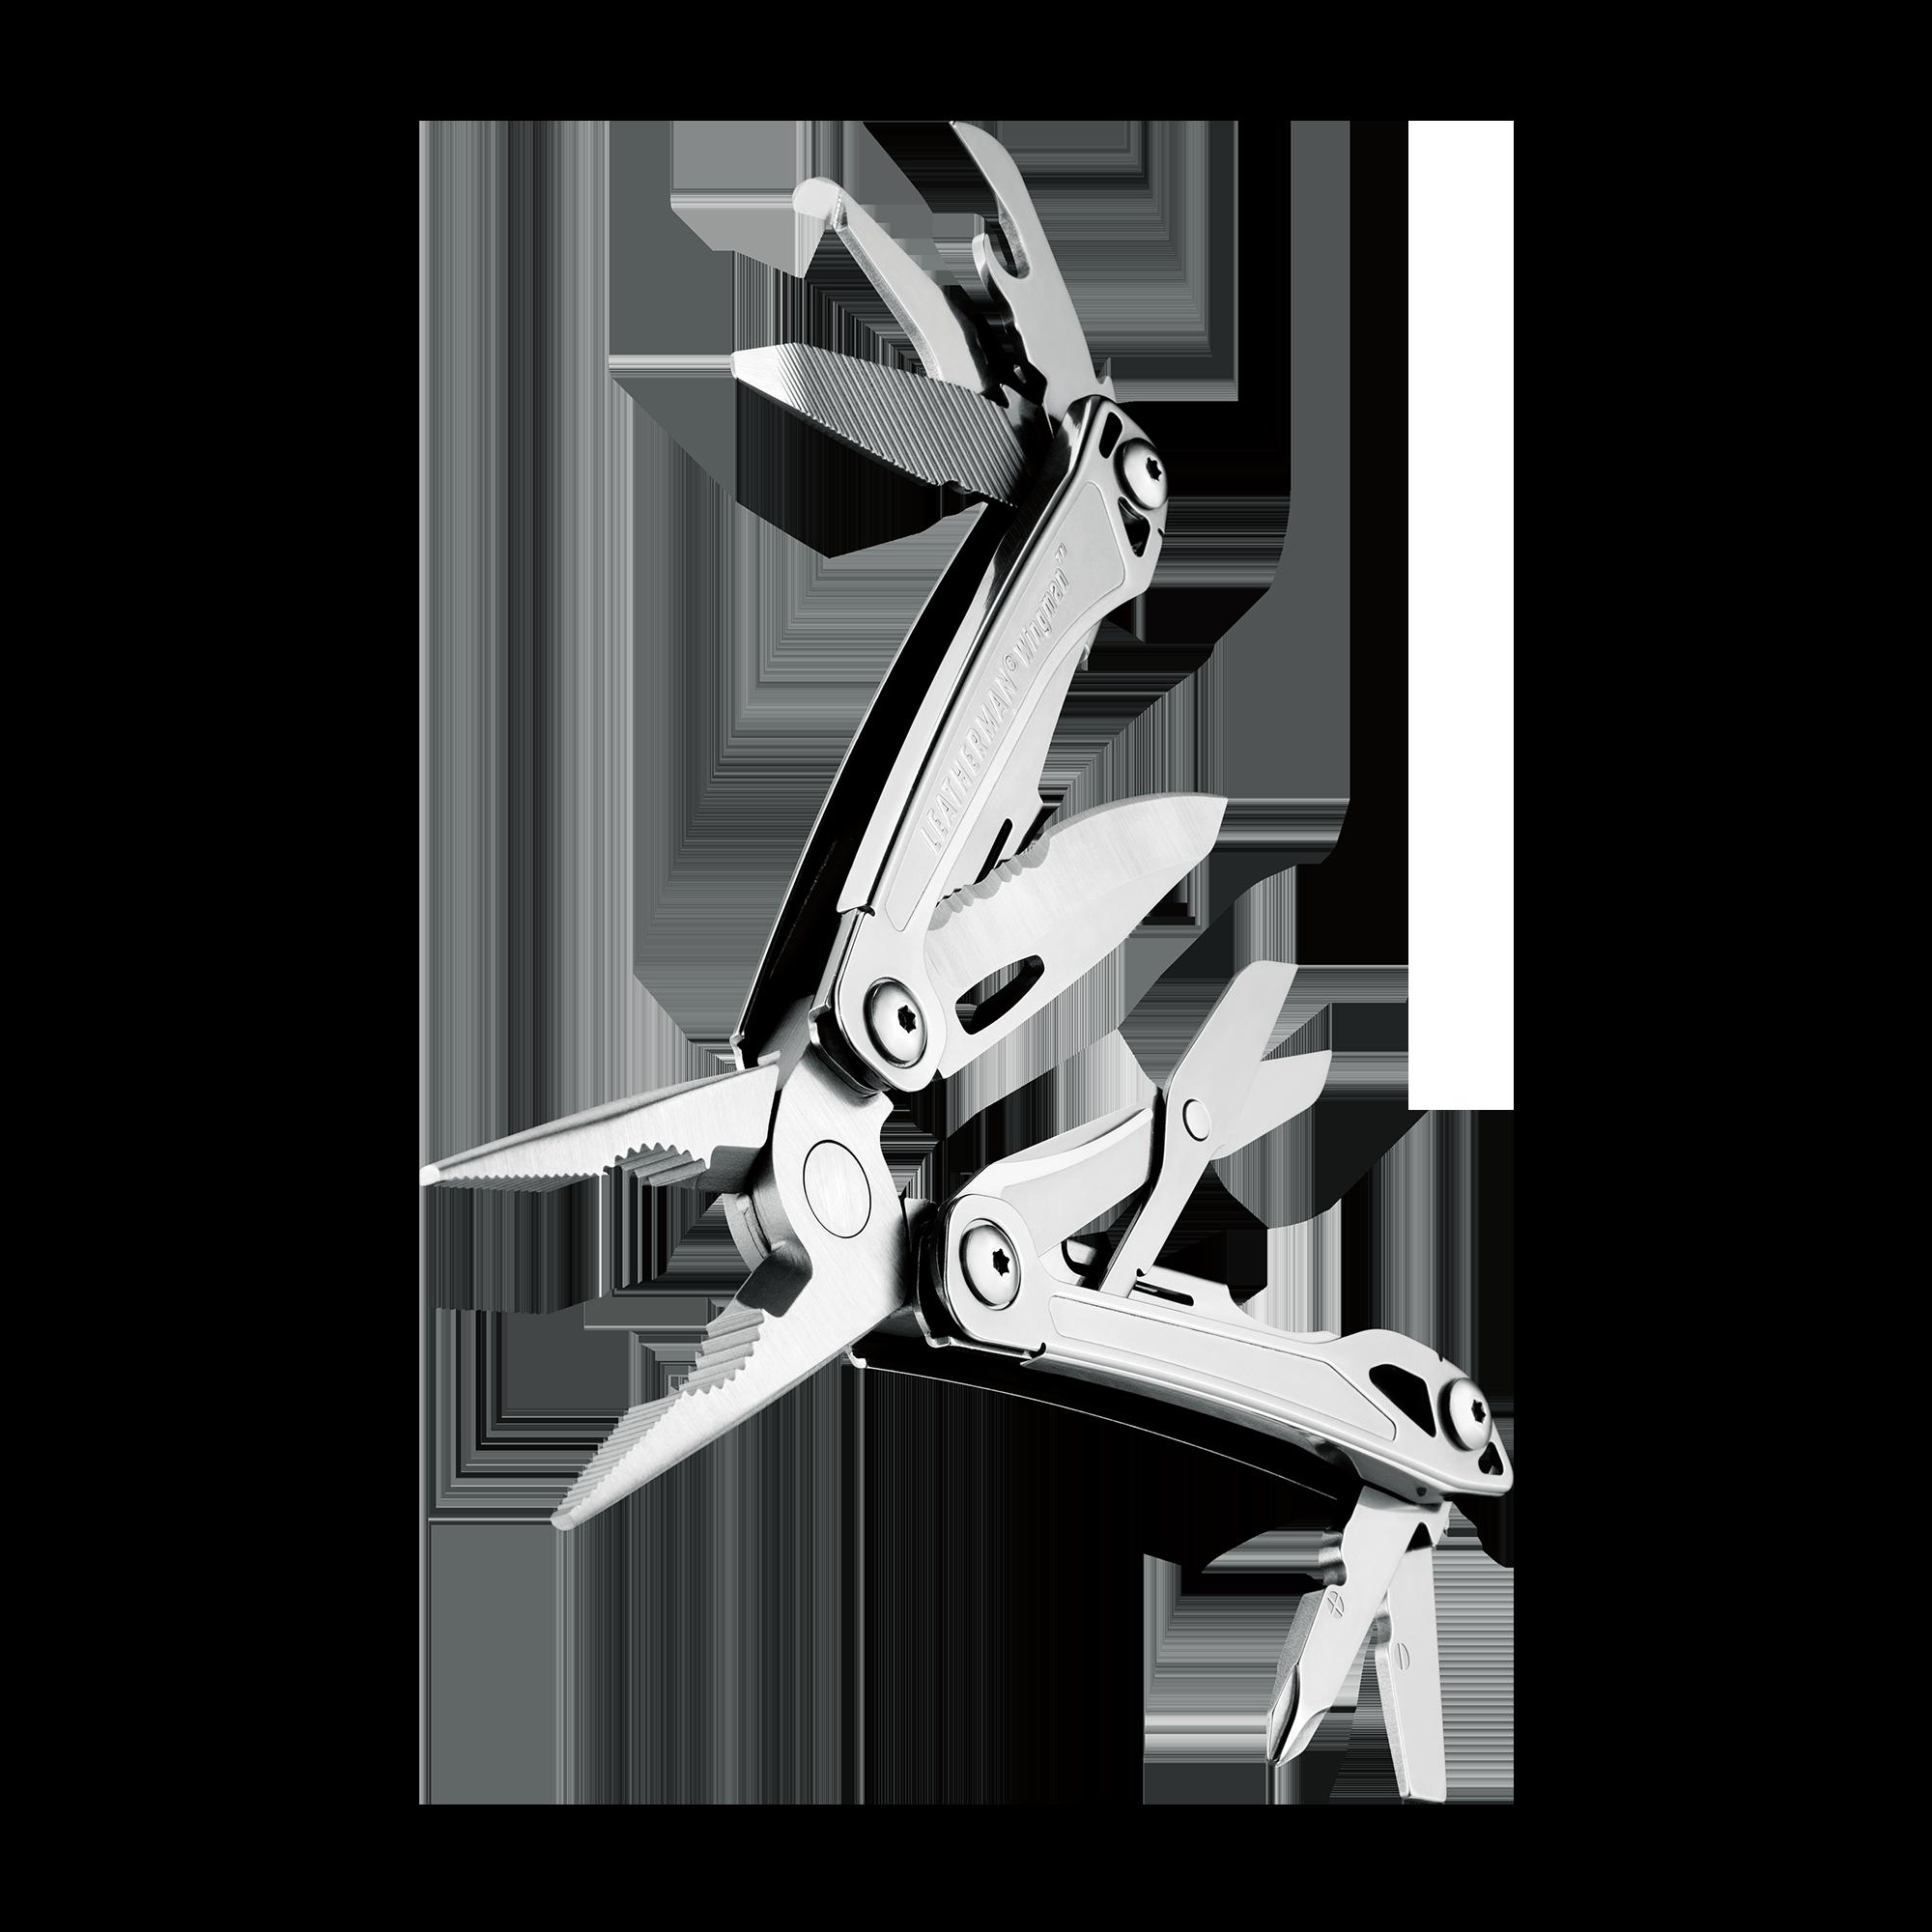 Leatherman wingman multi-tool, stainless steel, 14 tools, open fanned view